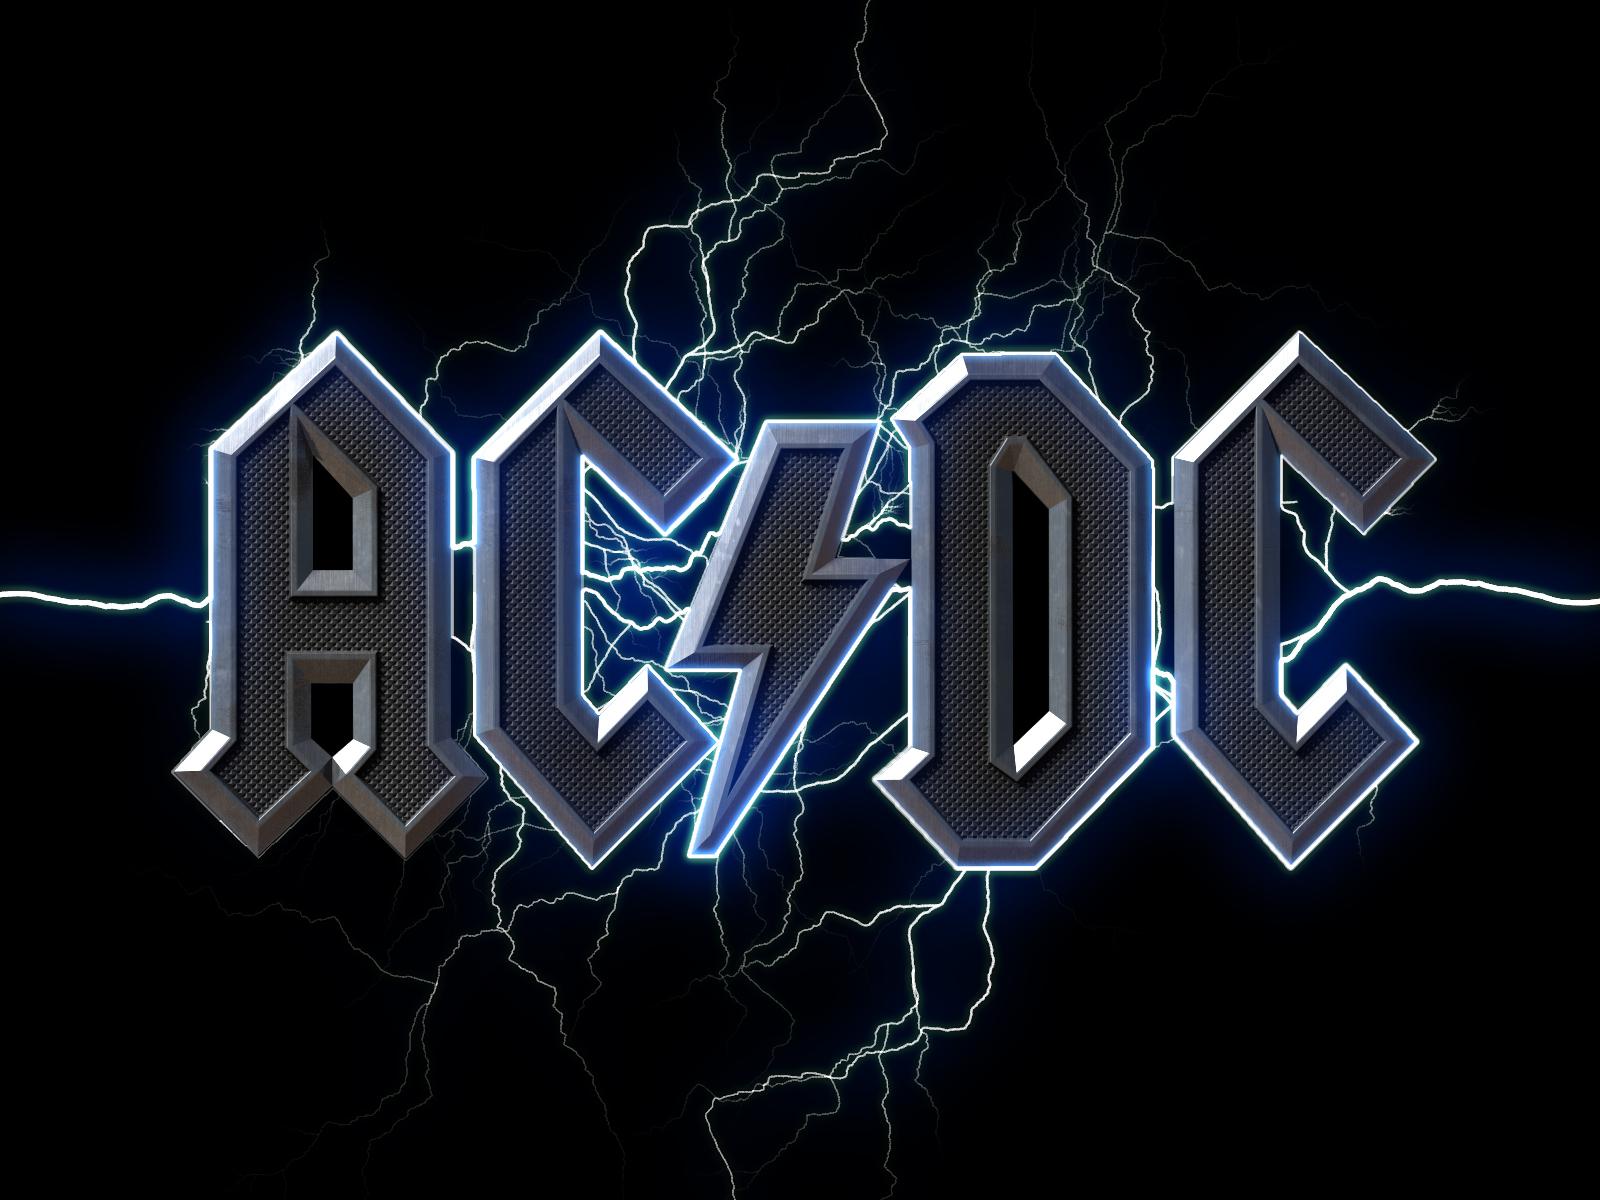 AC/DC - Hells Bells (REACTION!!!) - YouTube